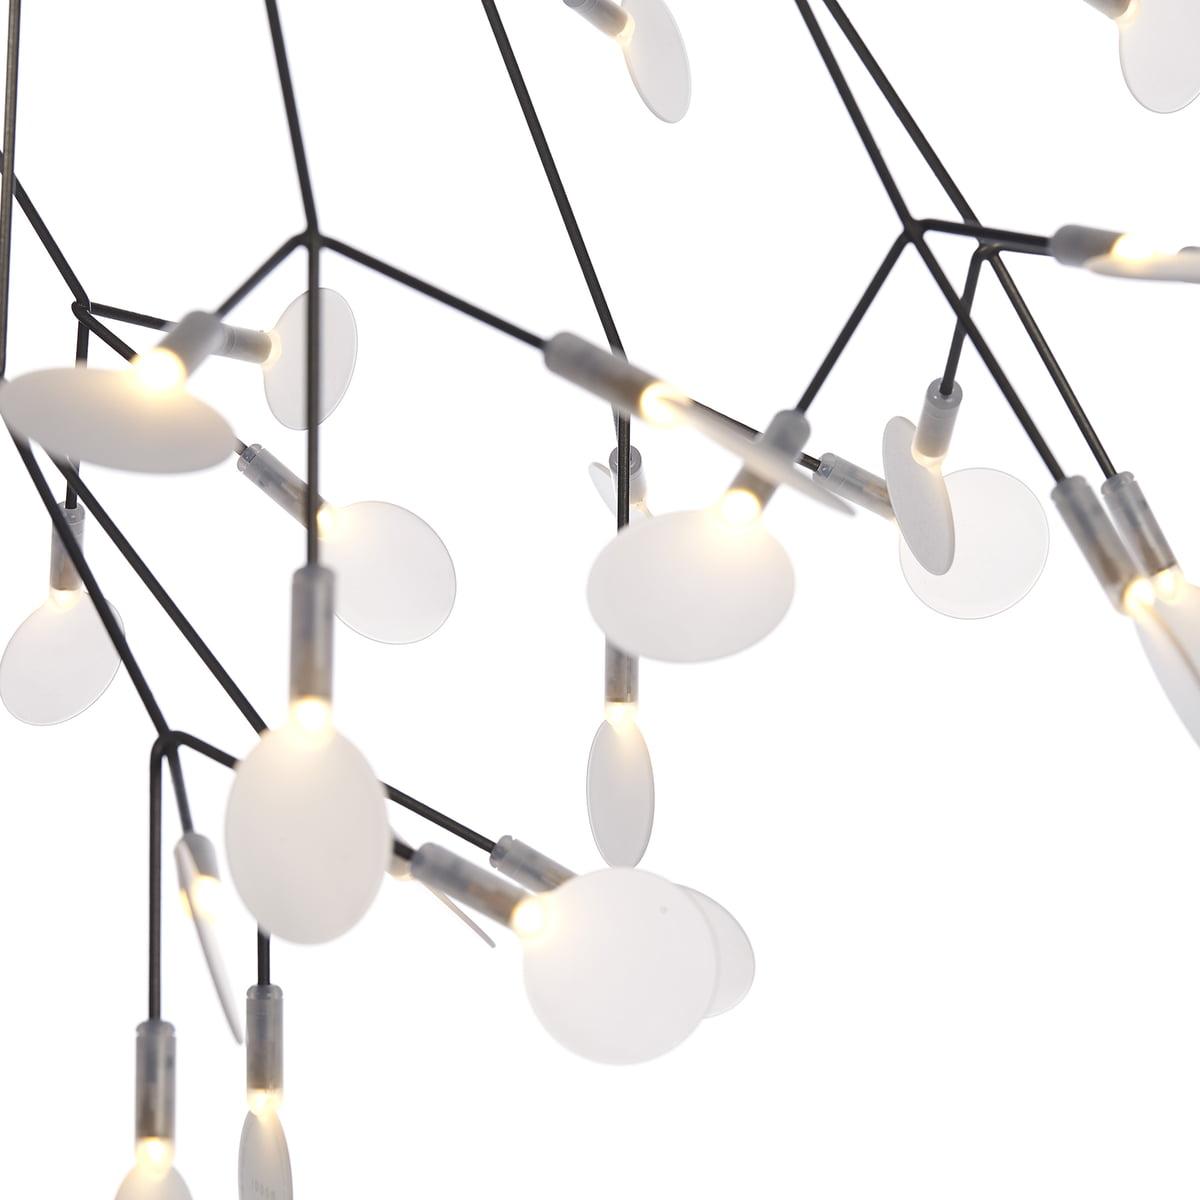 Heracleum Ii Small Pendant Lamp By Moooi